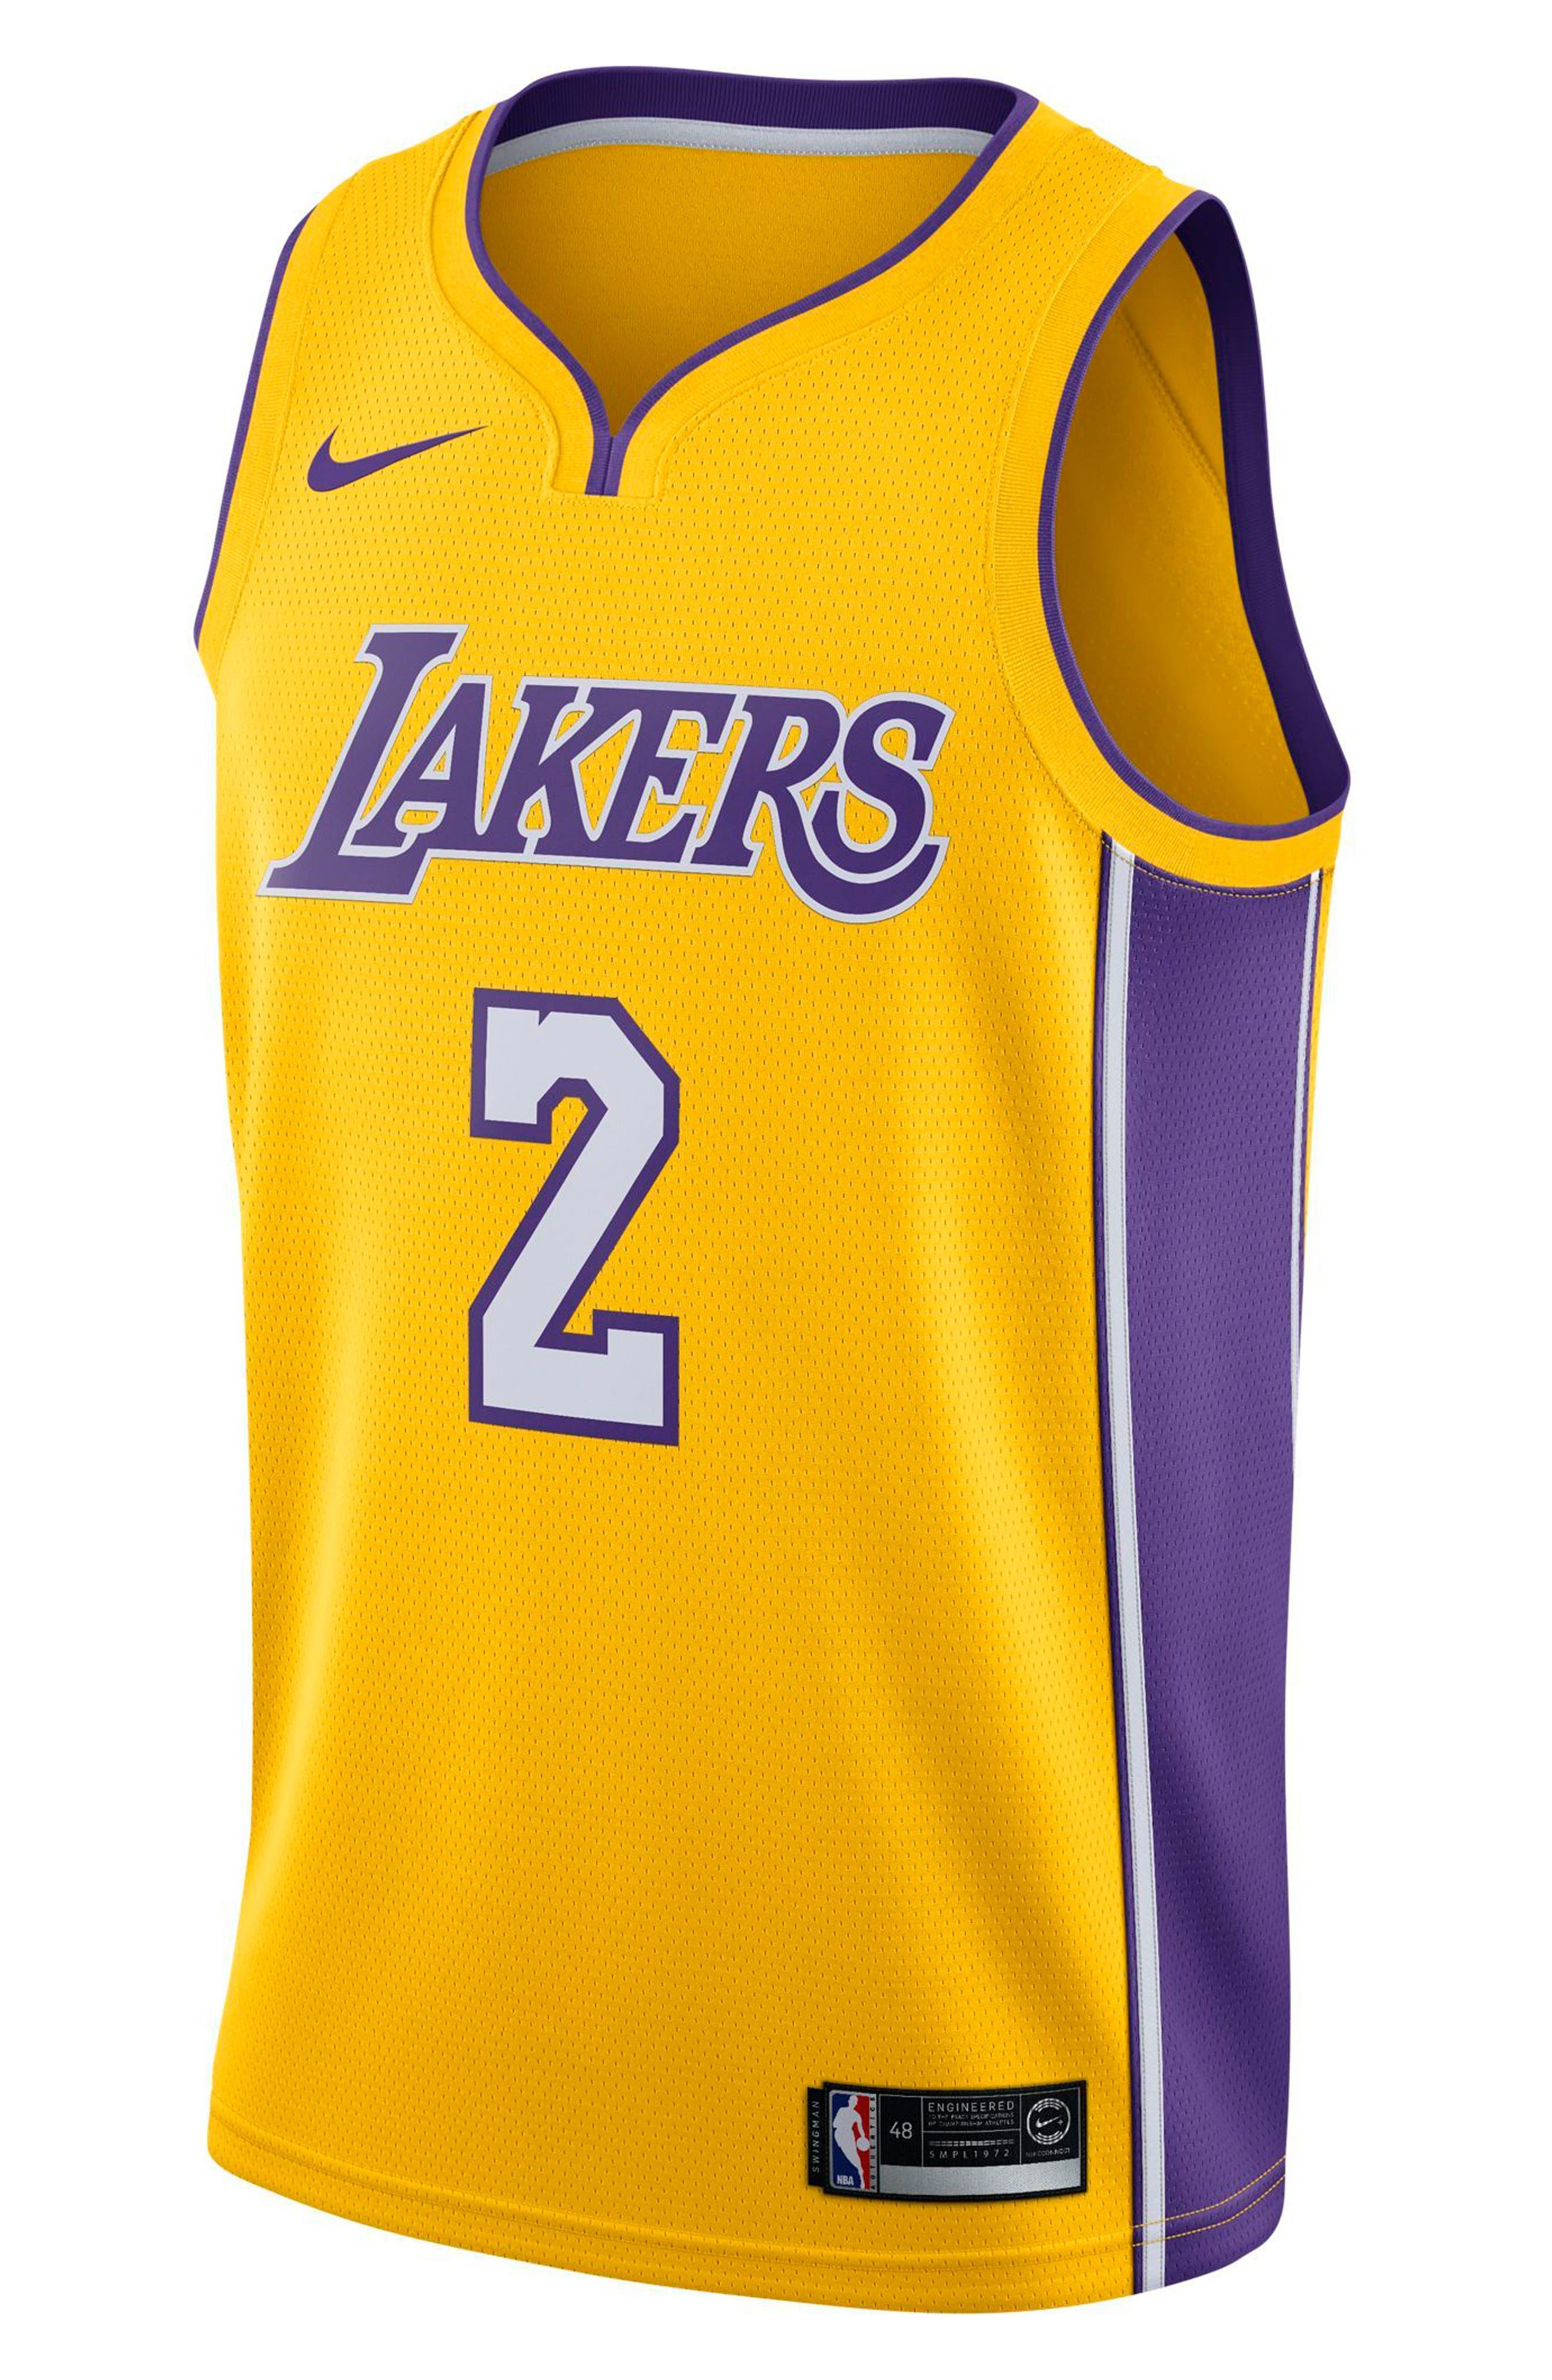 Los Angeles Lakers Nike Association Edition Swingman Men's NBA Jersey,                             Main thumbnail 1, color,                             736